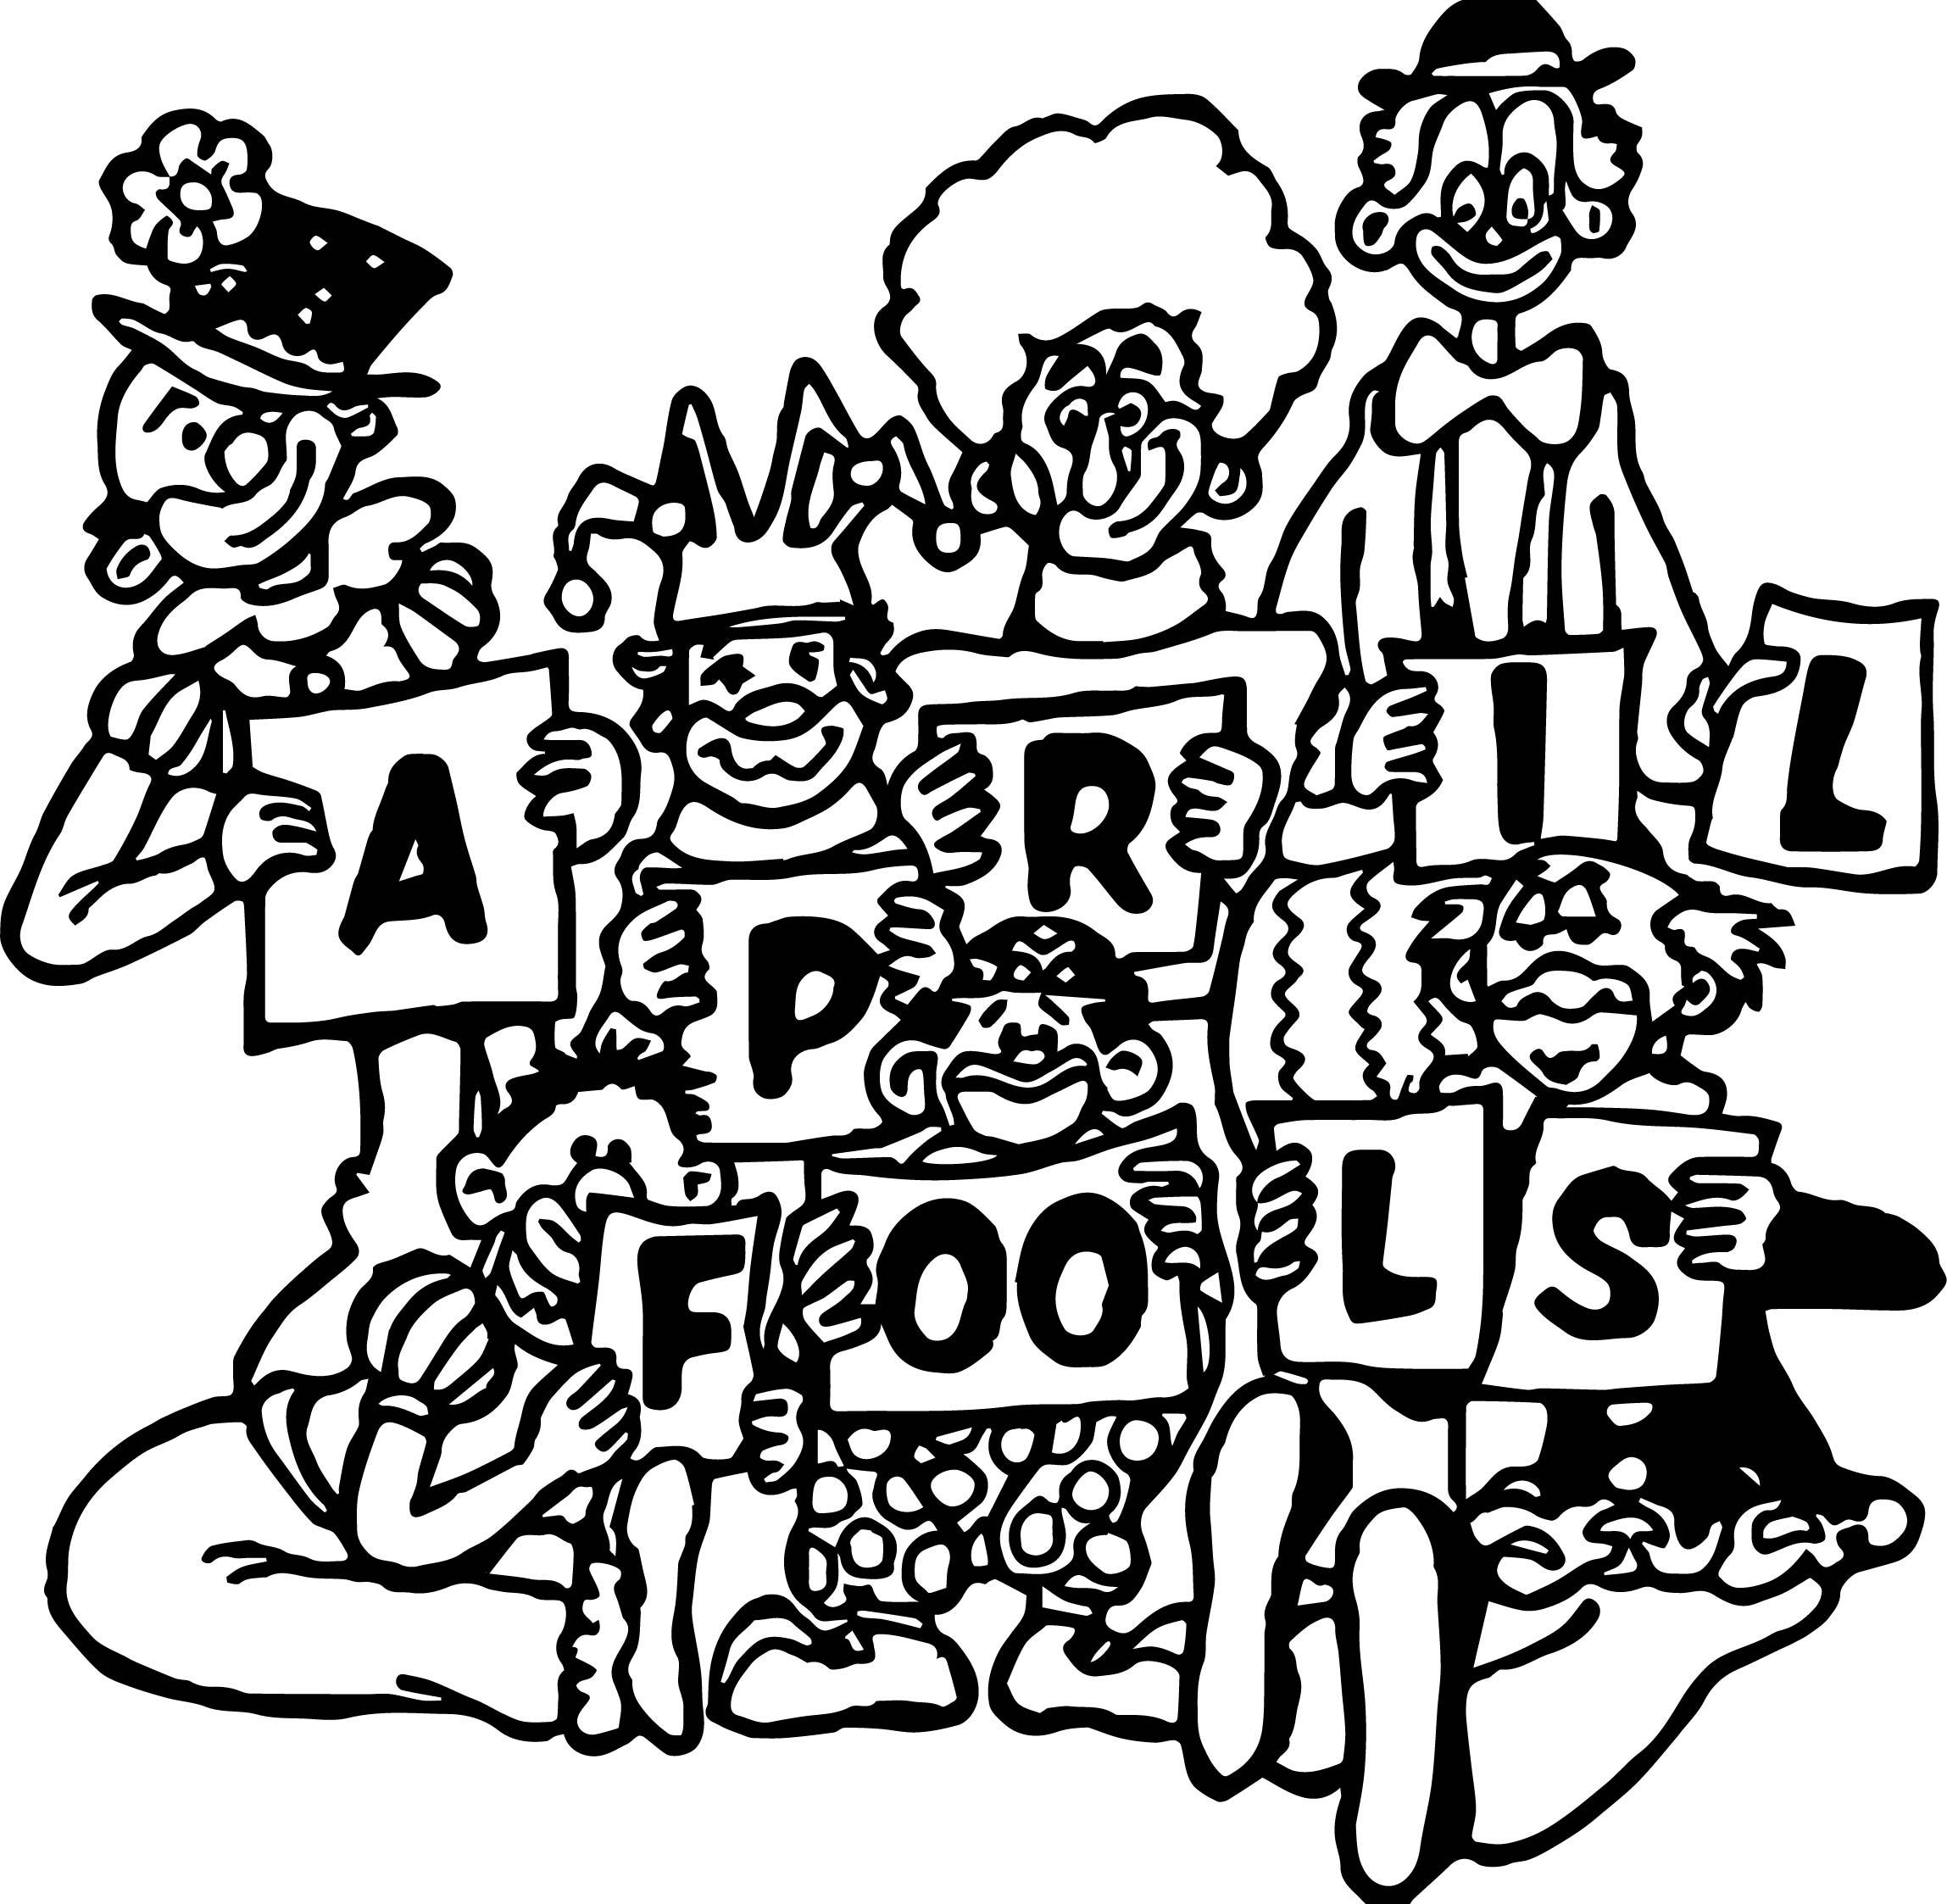 April Fools Coloring Page